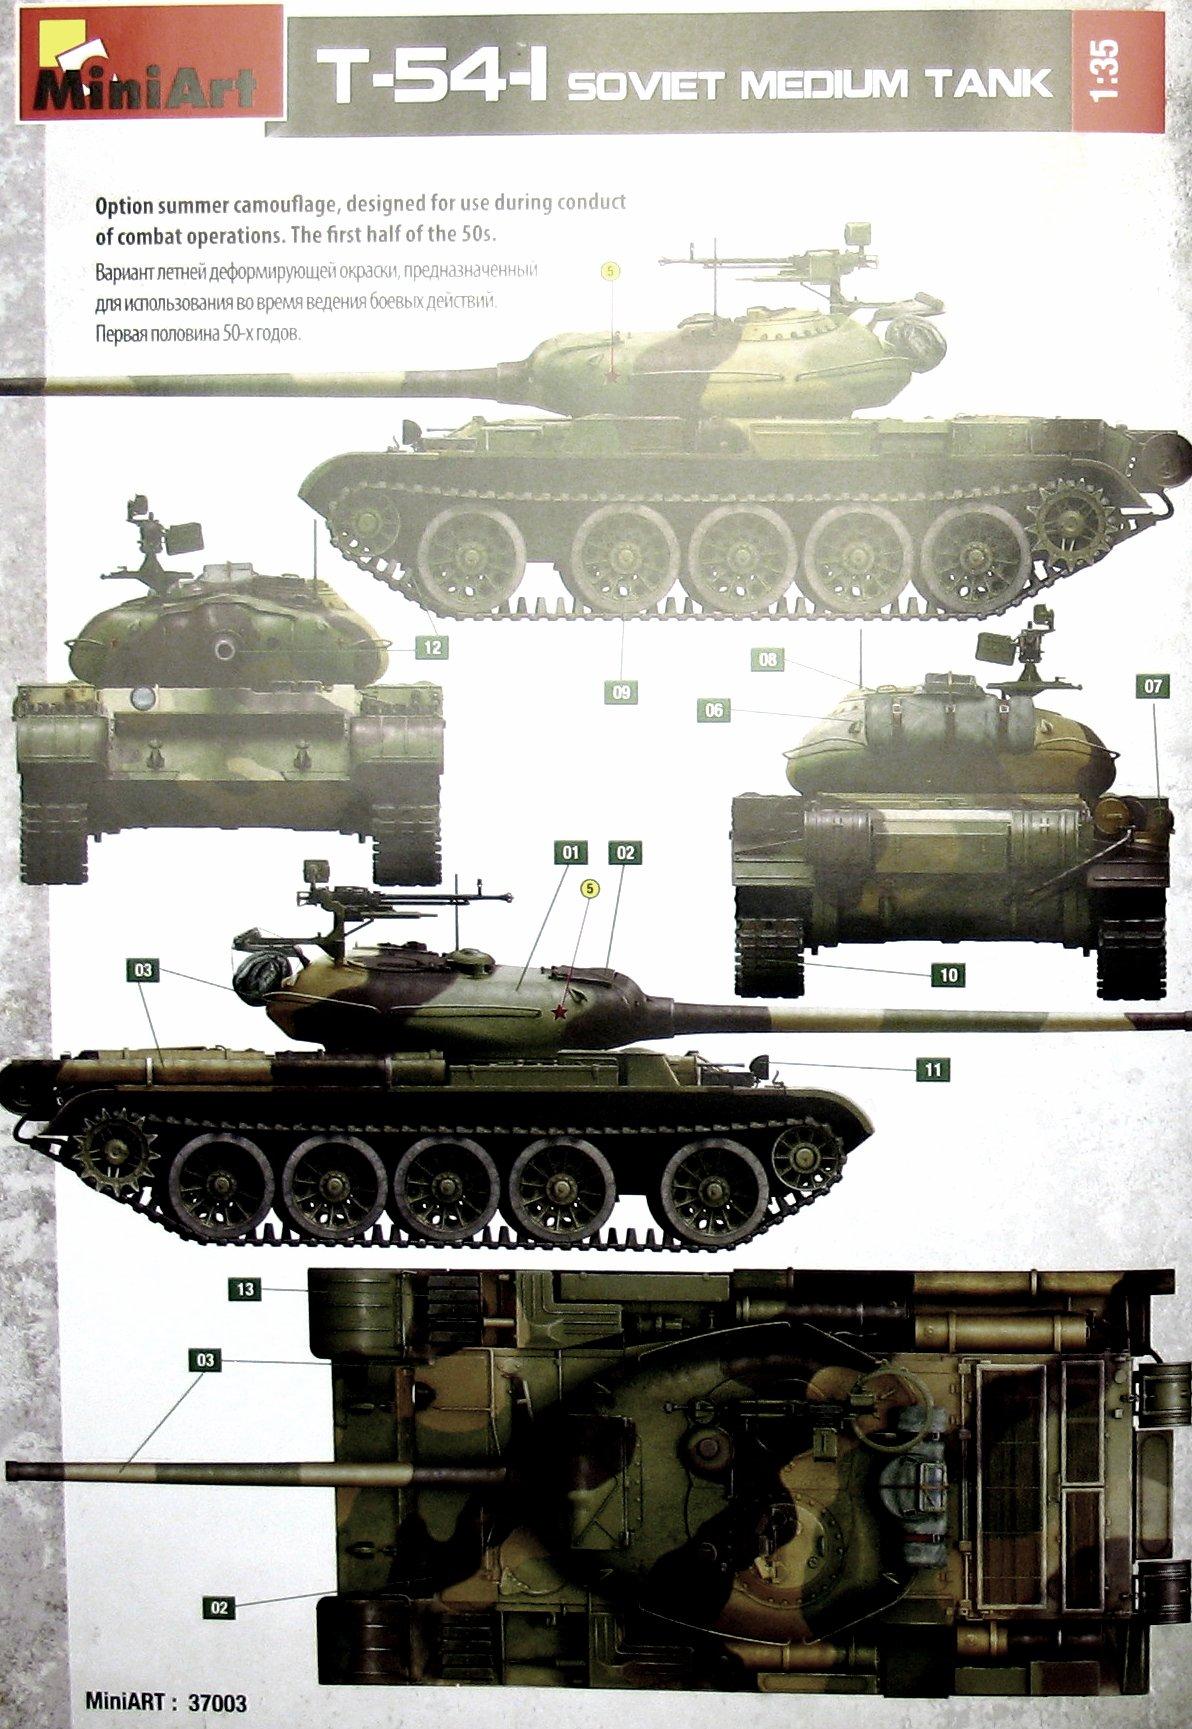 MiniArt 37003 T-54-1 Soviet Medium Tank